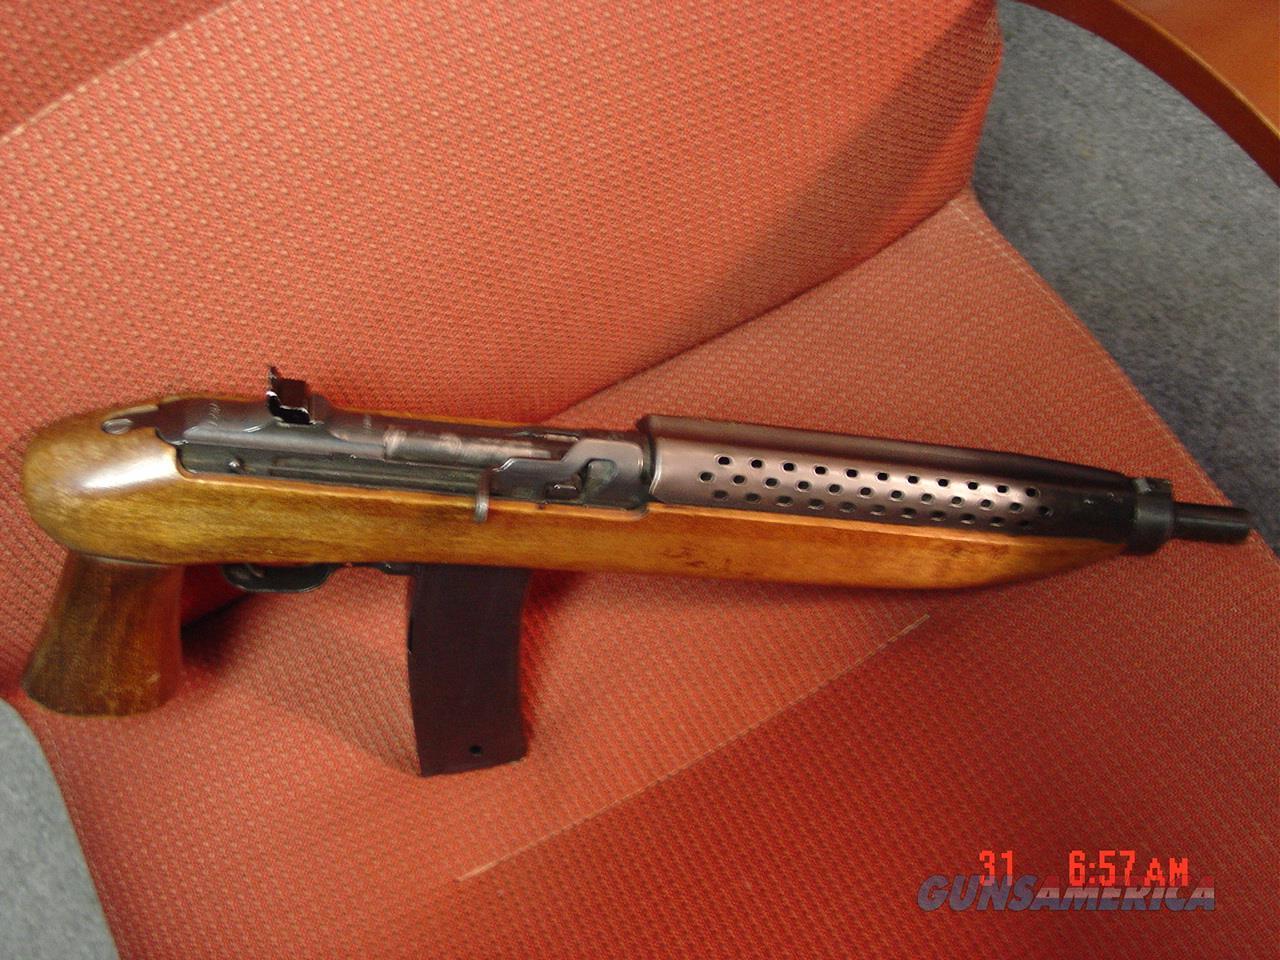 "Universal Enforcer model 3000,30 carbine,11 1/4""barrel,walnustock,30 round mag,pistol grip,metal handguard,M1 carbine action, awesome pistol to shoot !!   Guns > Pistols > Iver Johnson Pistols"